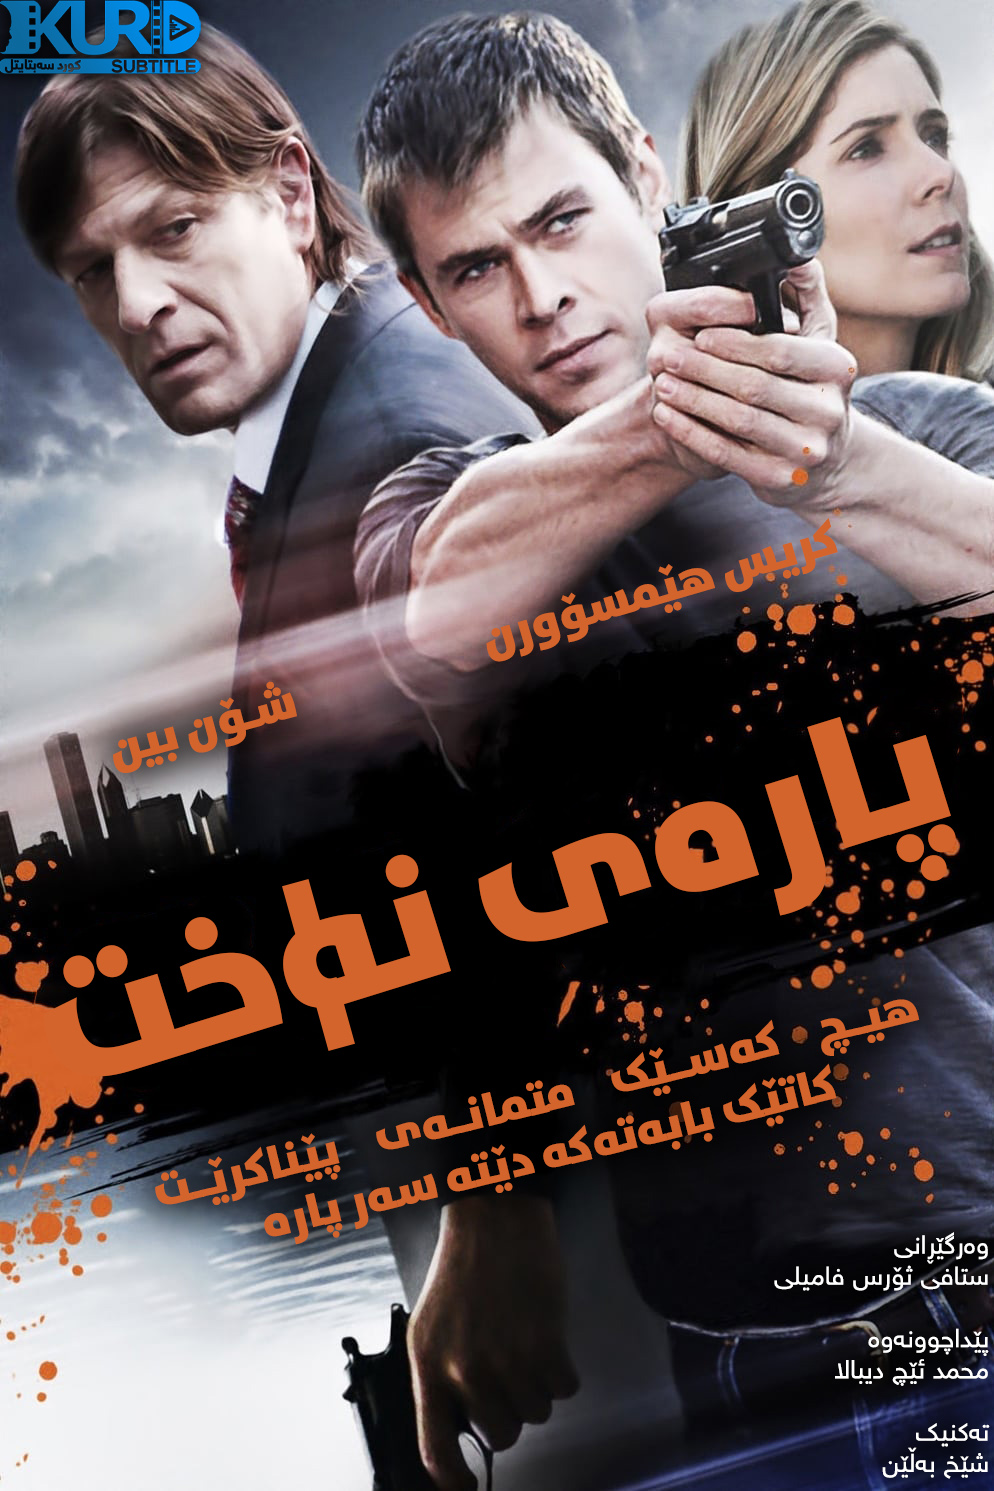 Ca$h kurdish poster